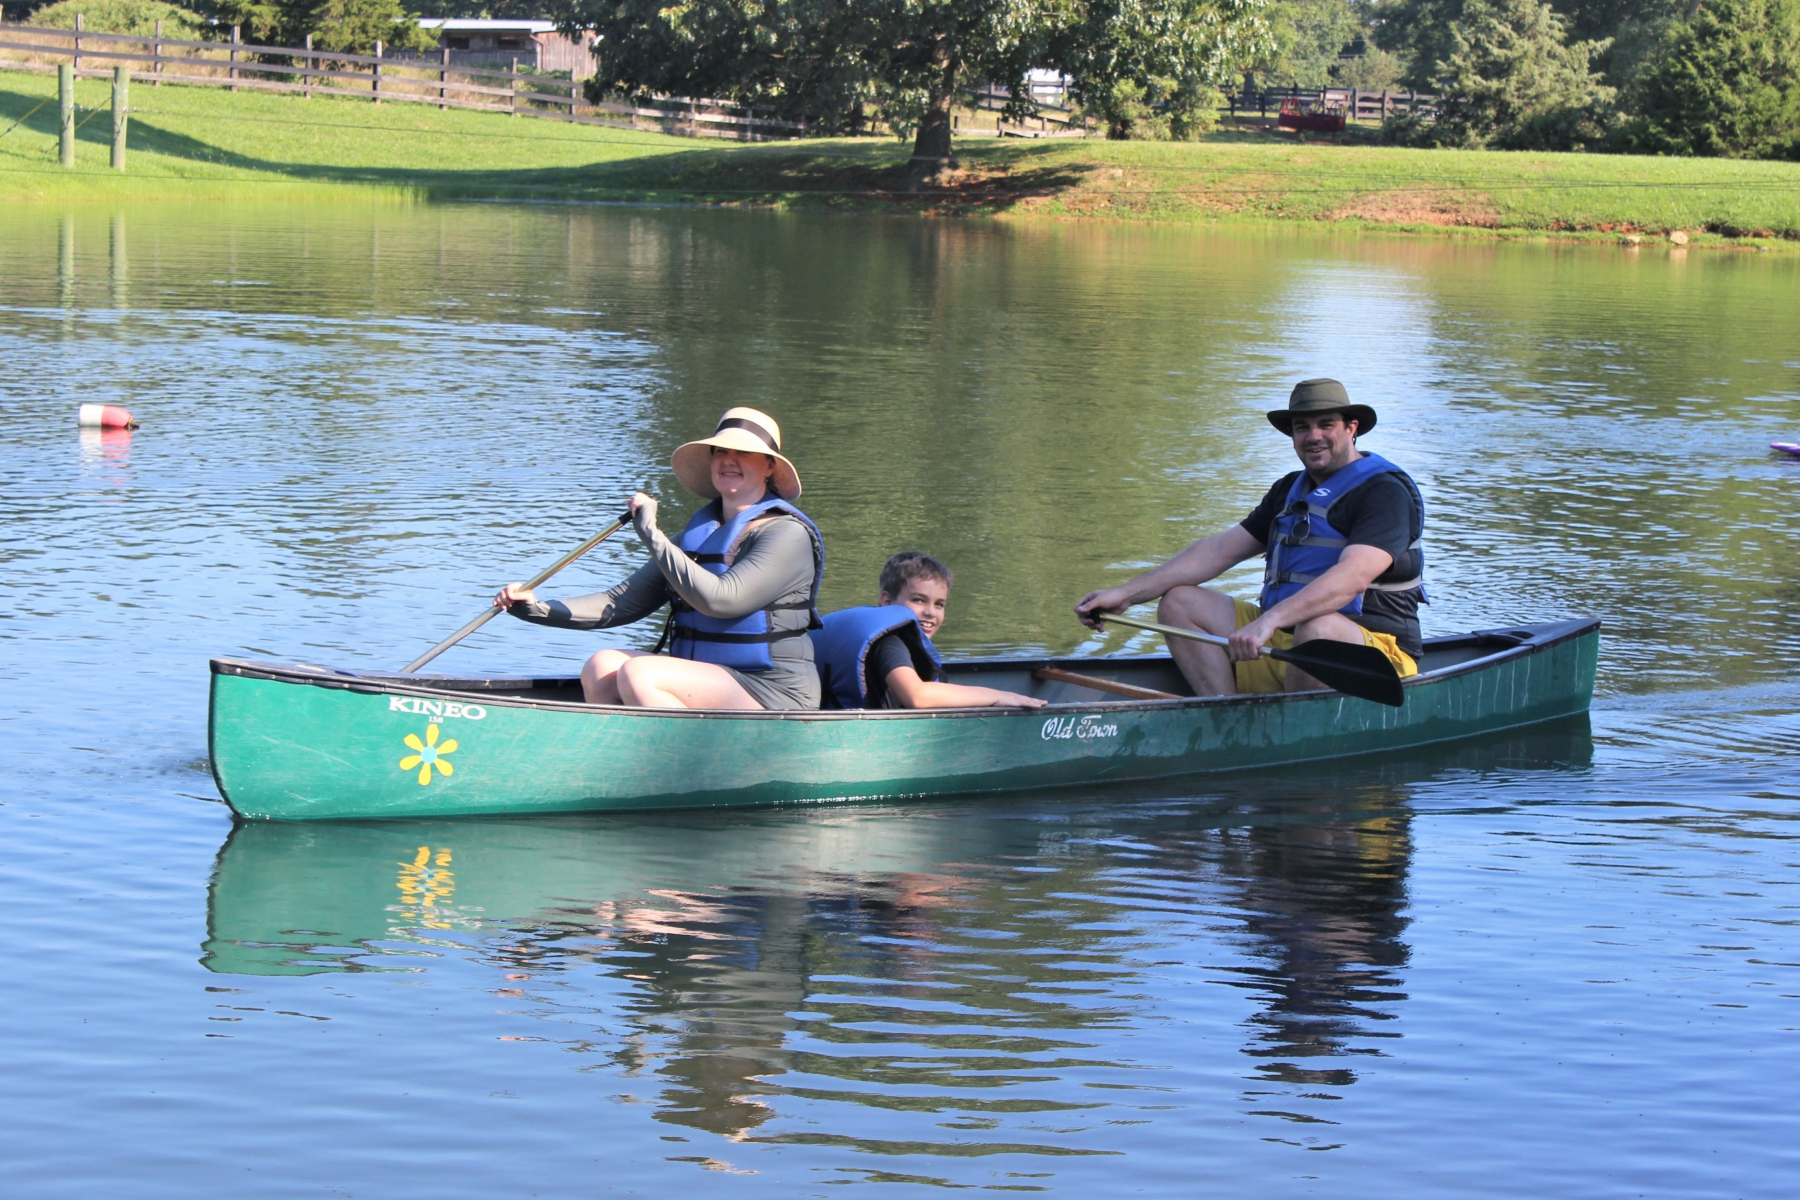 Watercraft Activity